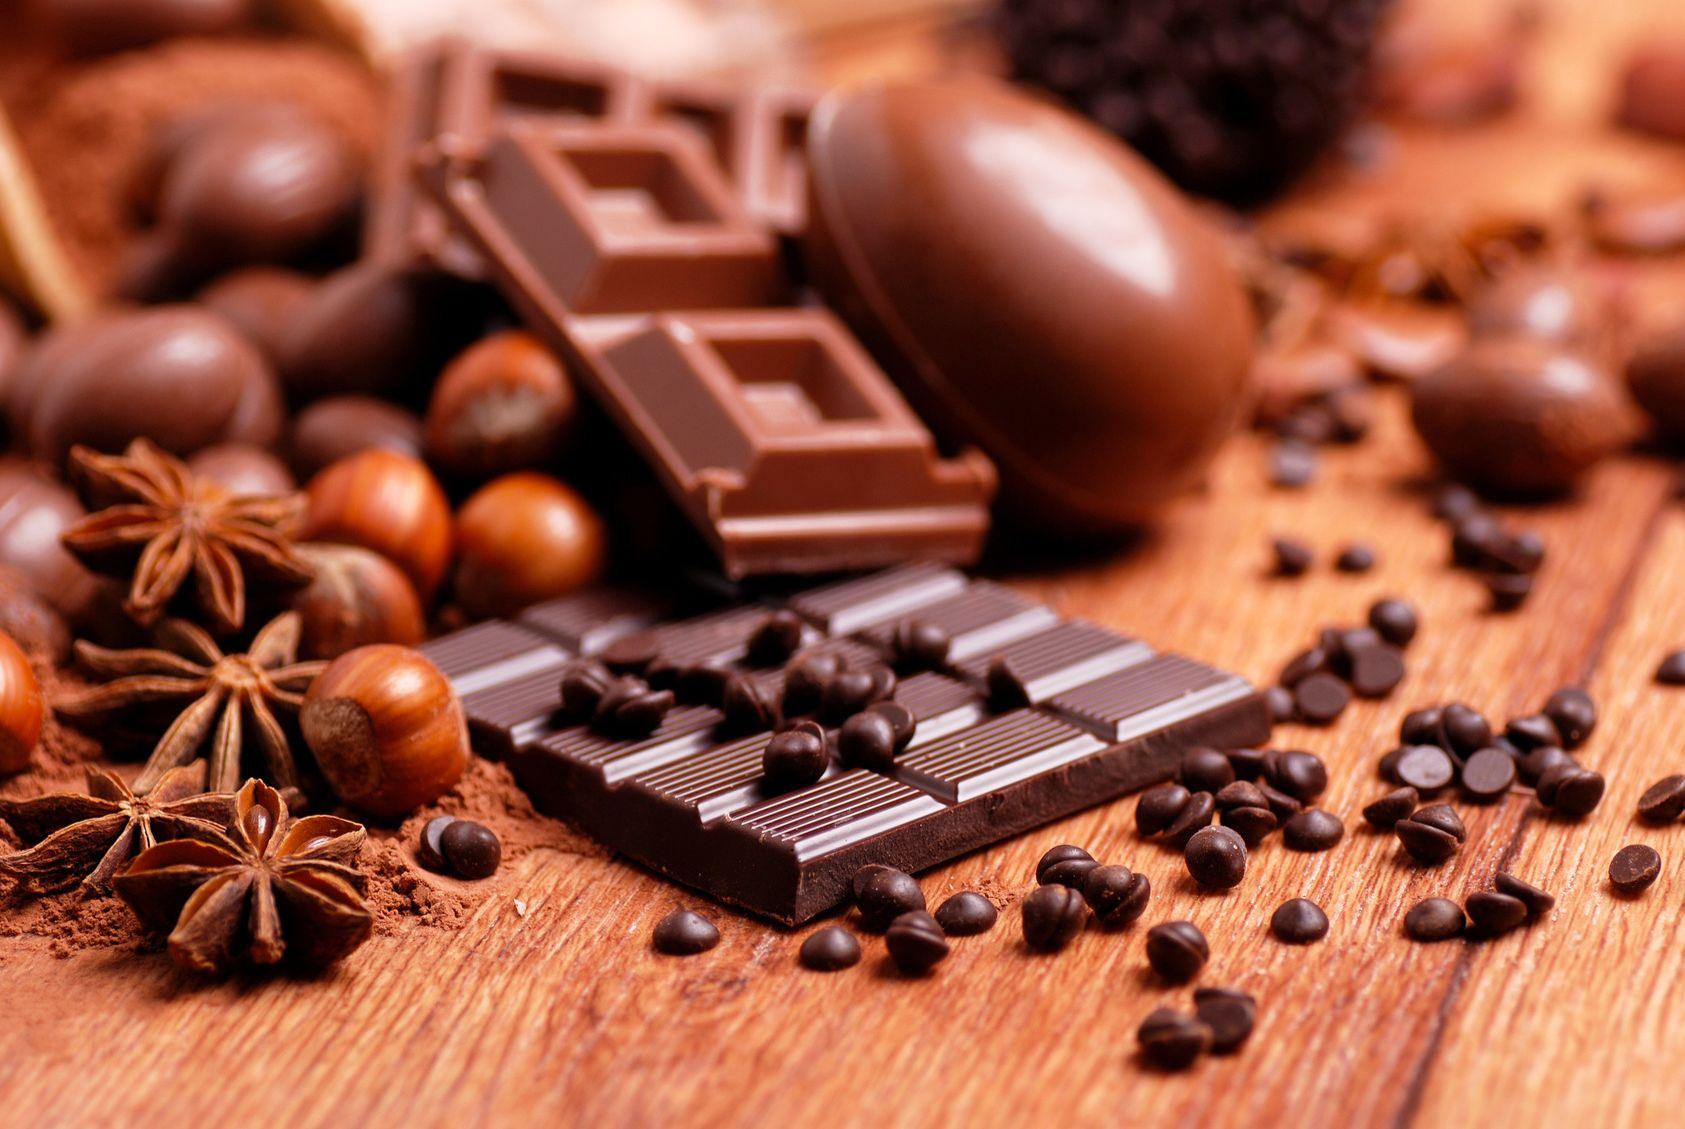 Résidence seniors Anne - EMERA à Grasse - Atelier chocolat